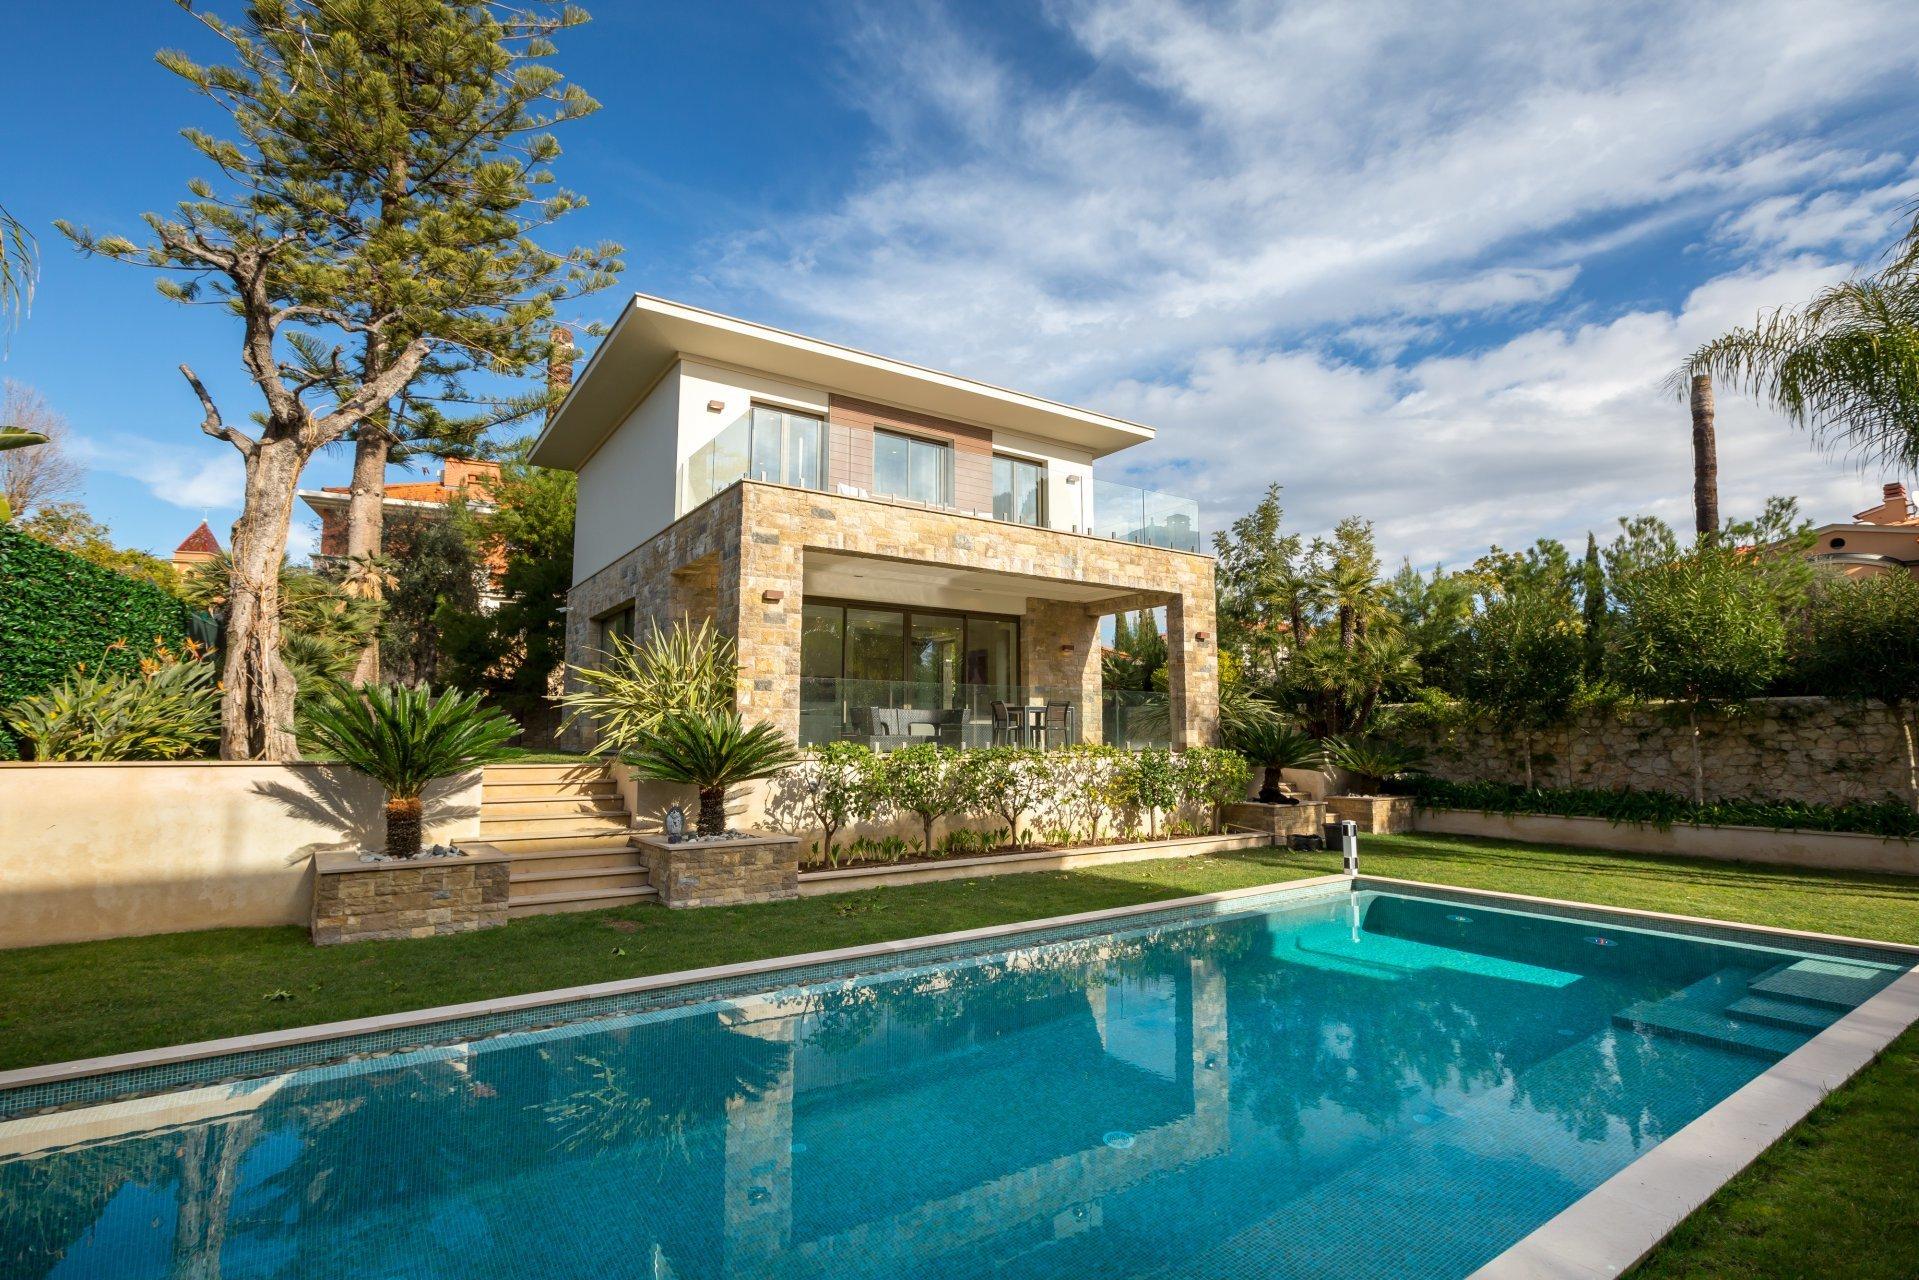 Villa in Saint-Jean-Cap-Ferrat, Provence-Alpes-Côte d'Azur, France 1